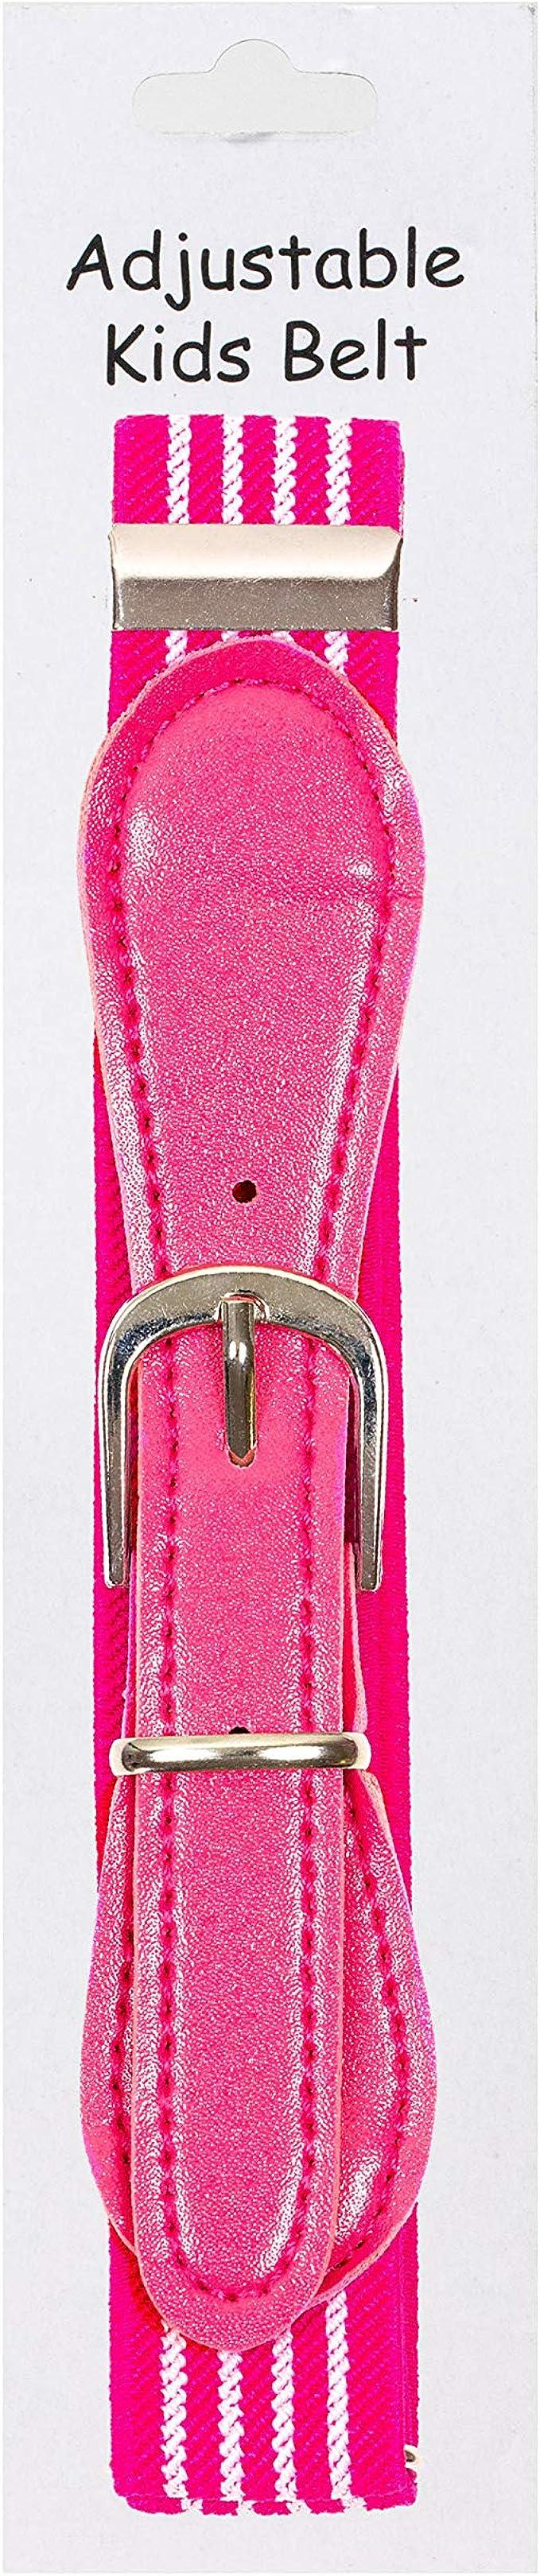 Fancy Kids Elastic Adjustable Buckle Belt Availaible in 13 colors